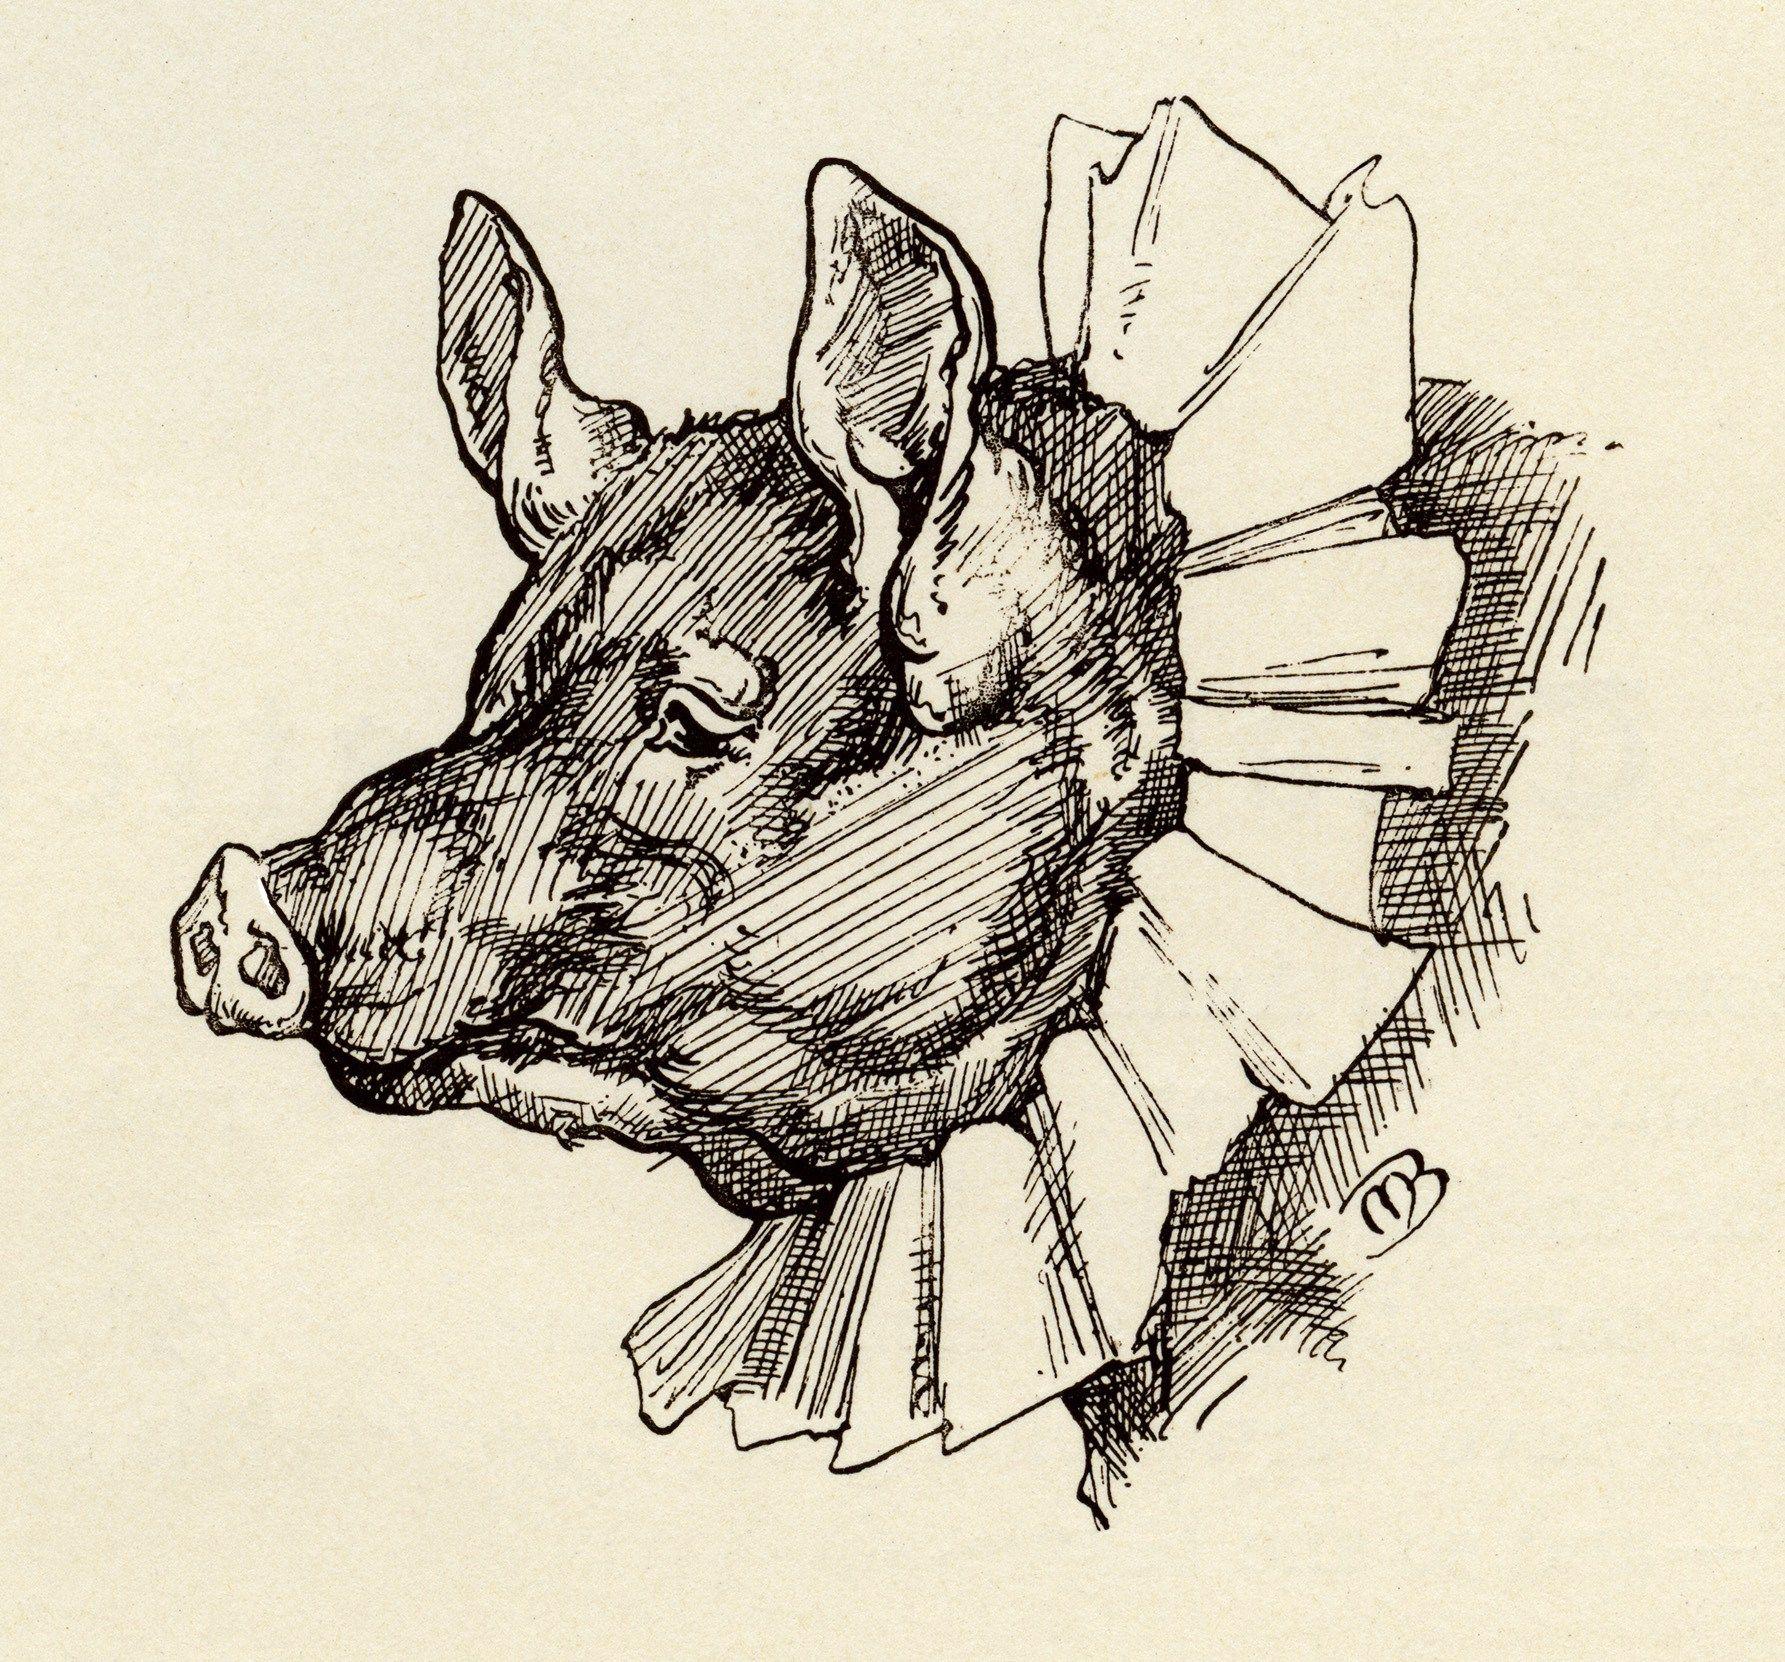 1785x1662 Whimsical Pig Clip Art, Black And White Graphics, Vintage Pig